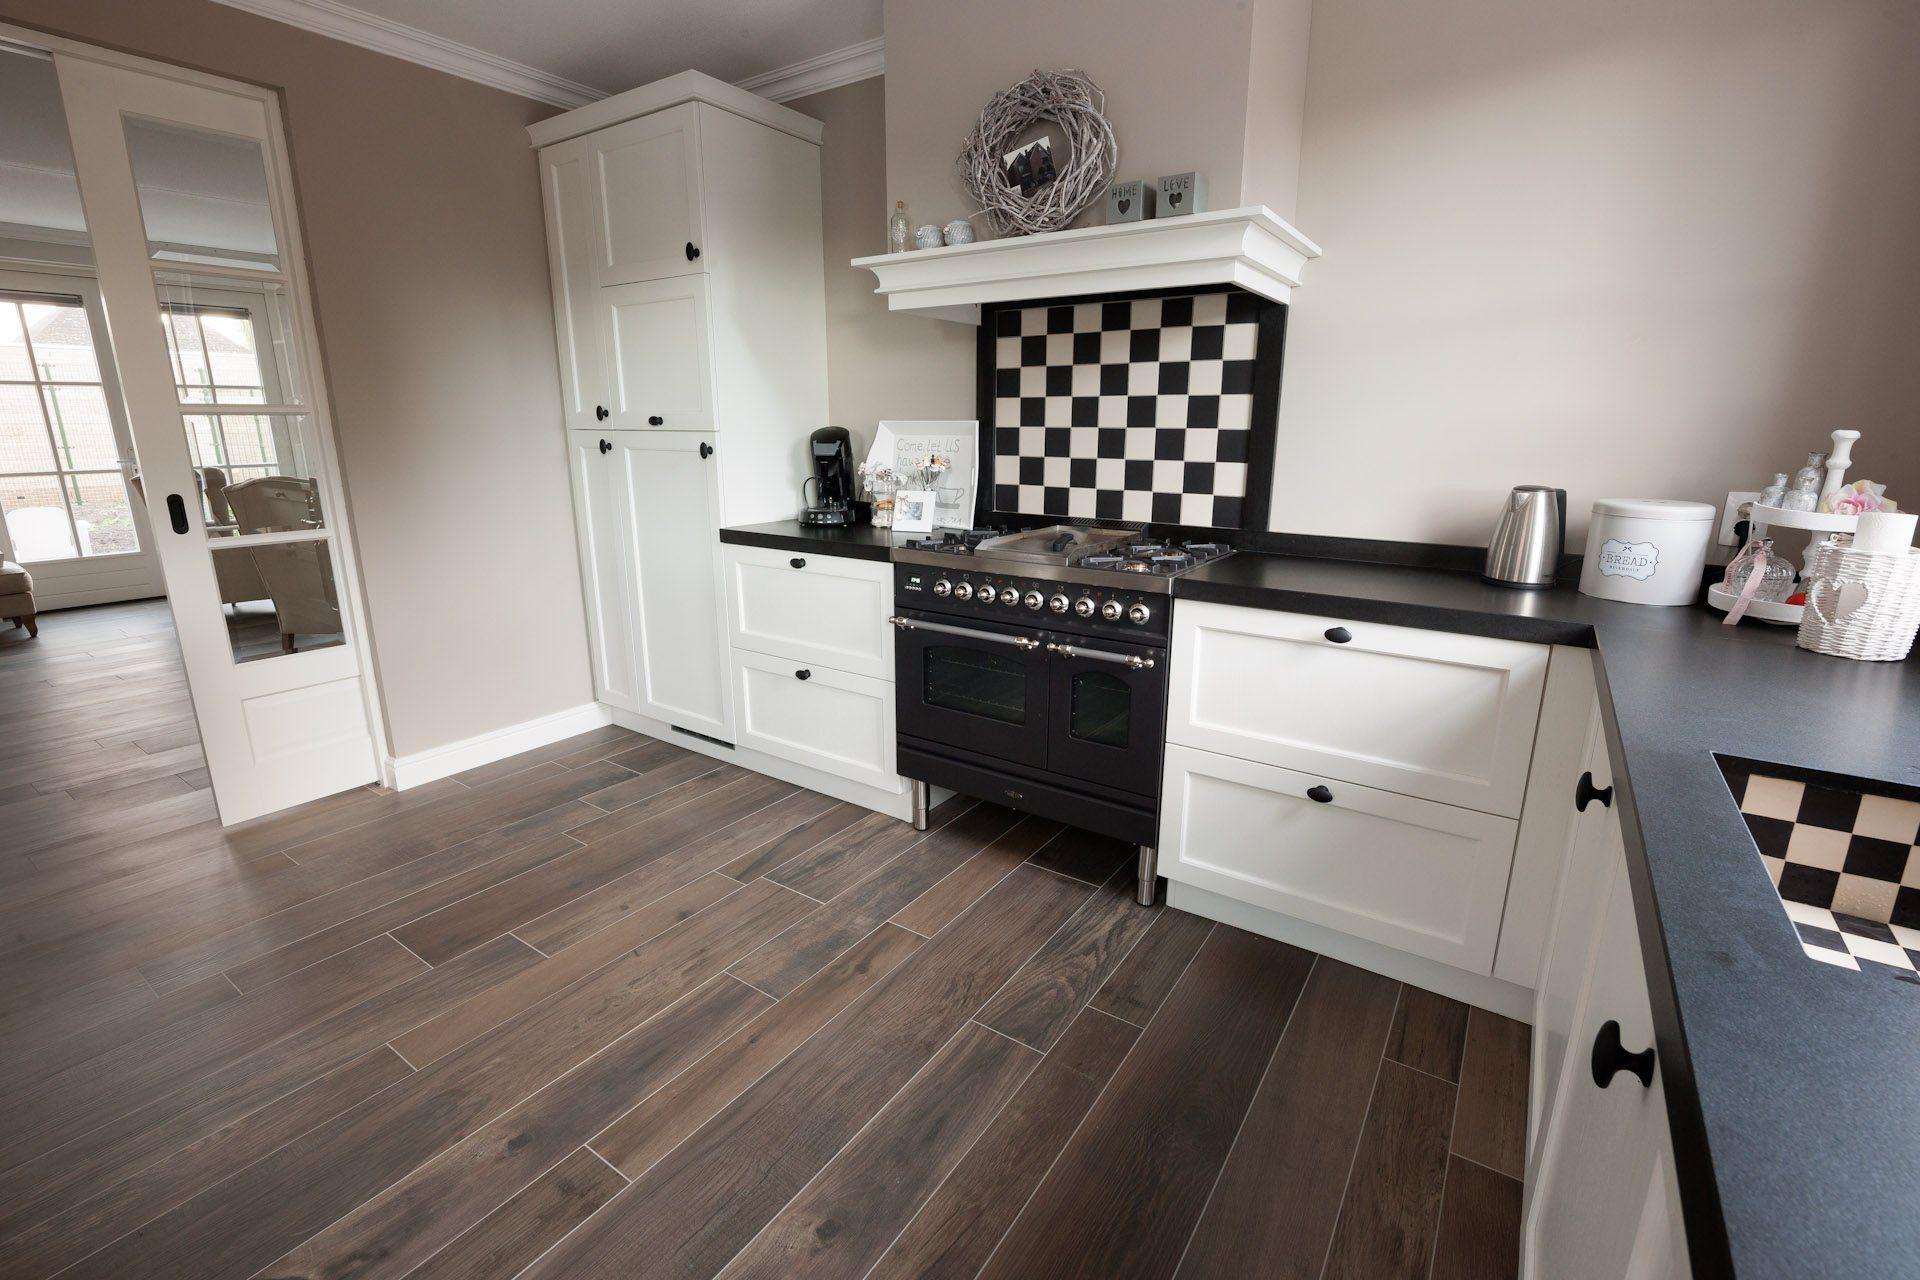 Vloertegels verouderd leisteen keuken keuken